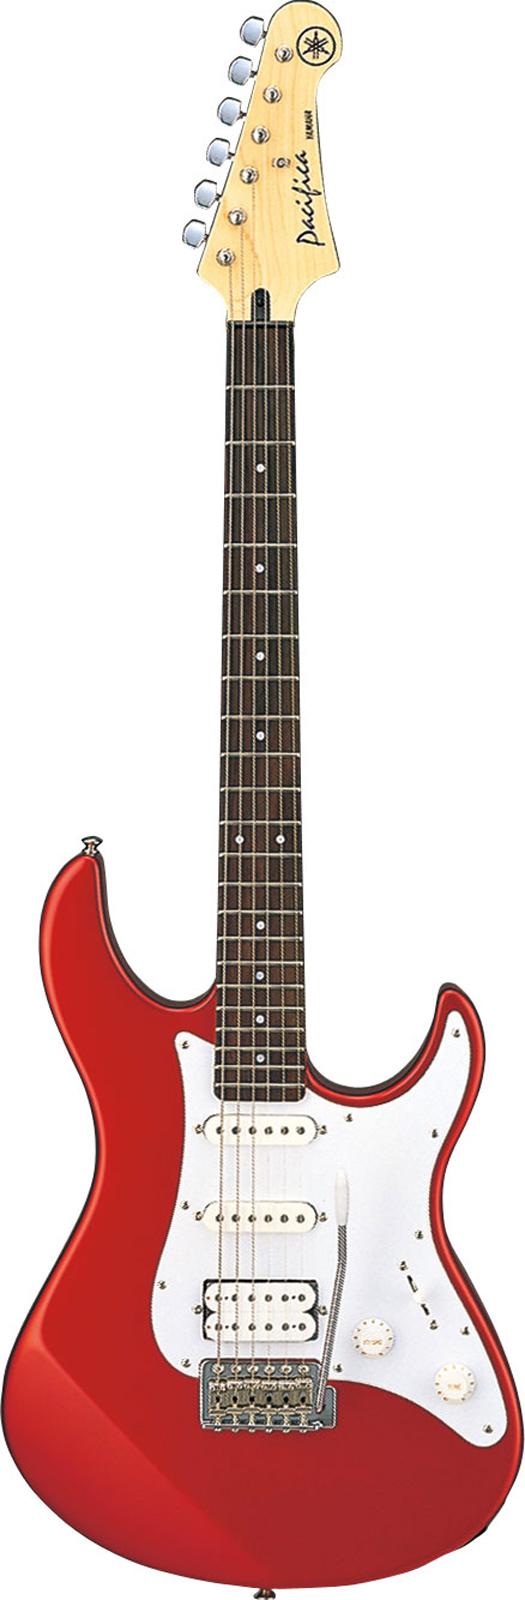 Yamaha Pa012rm Red Metallic